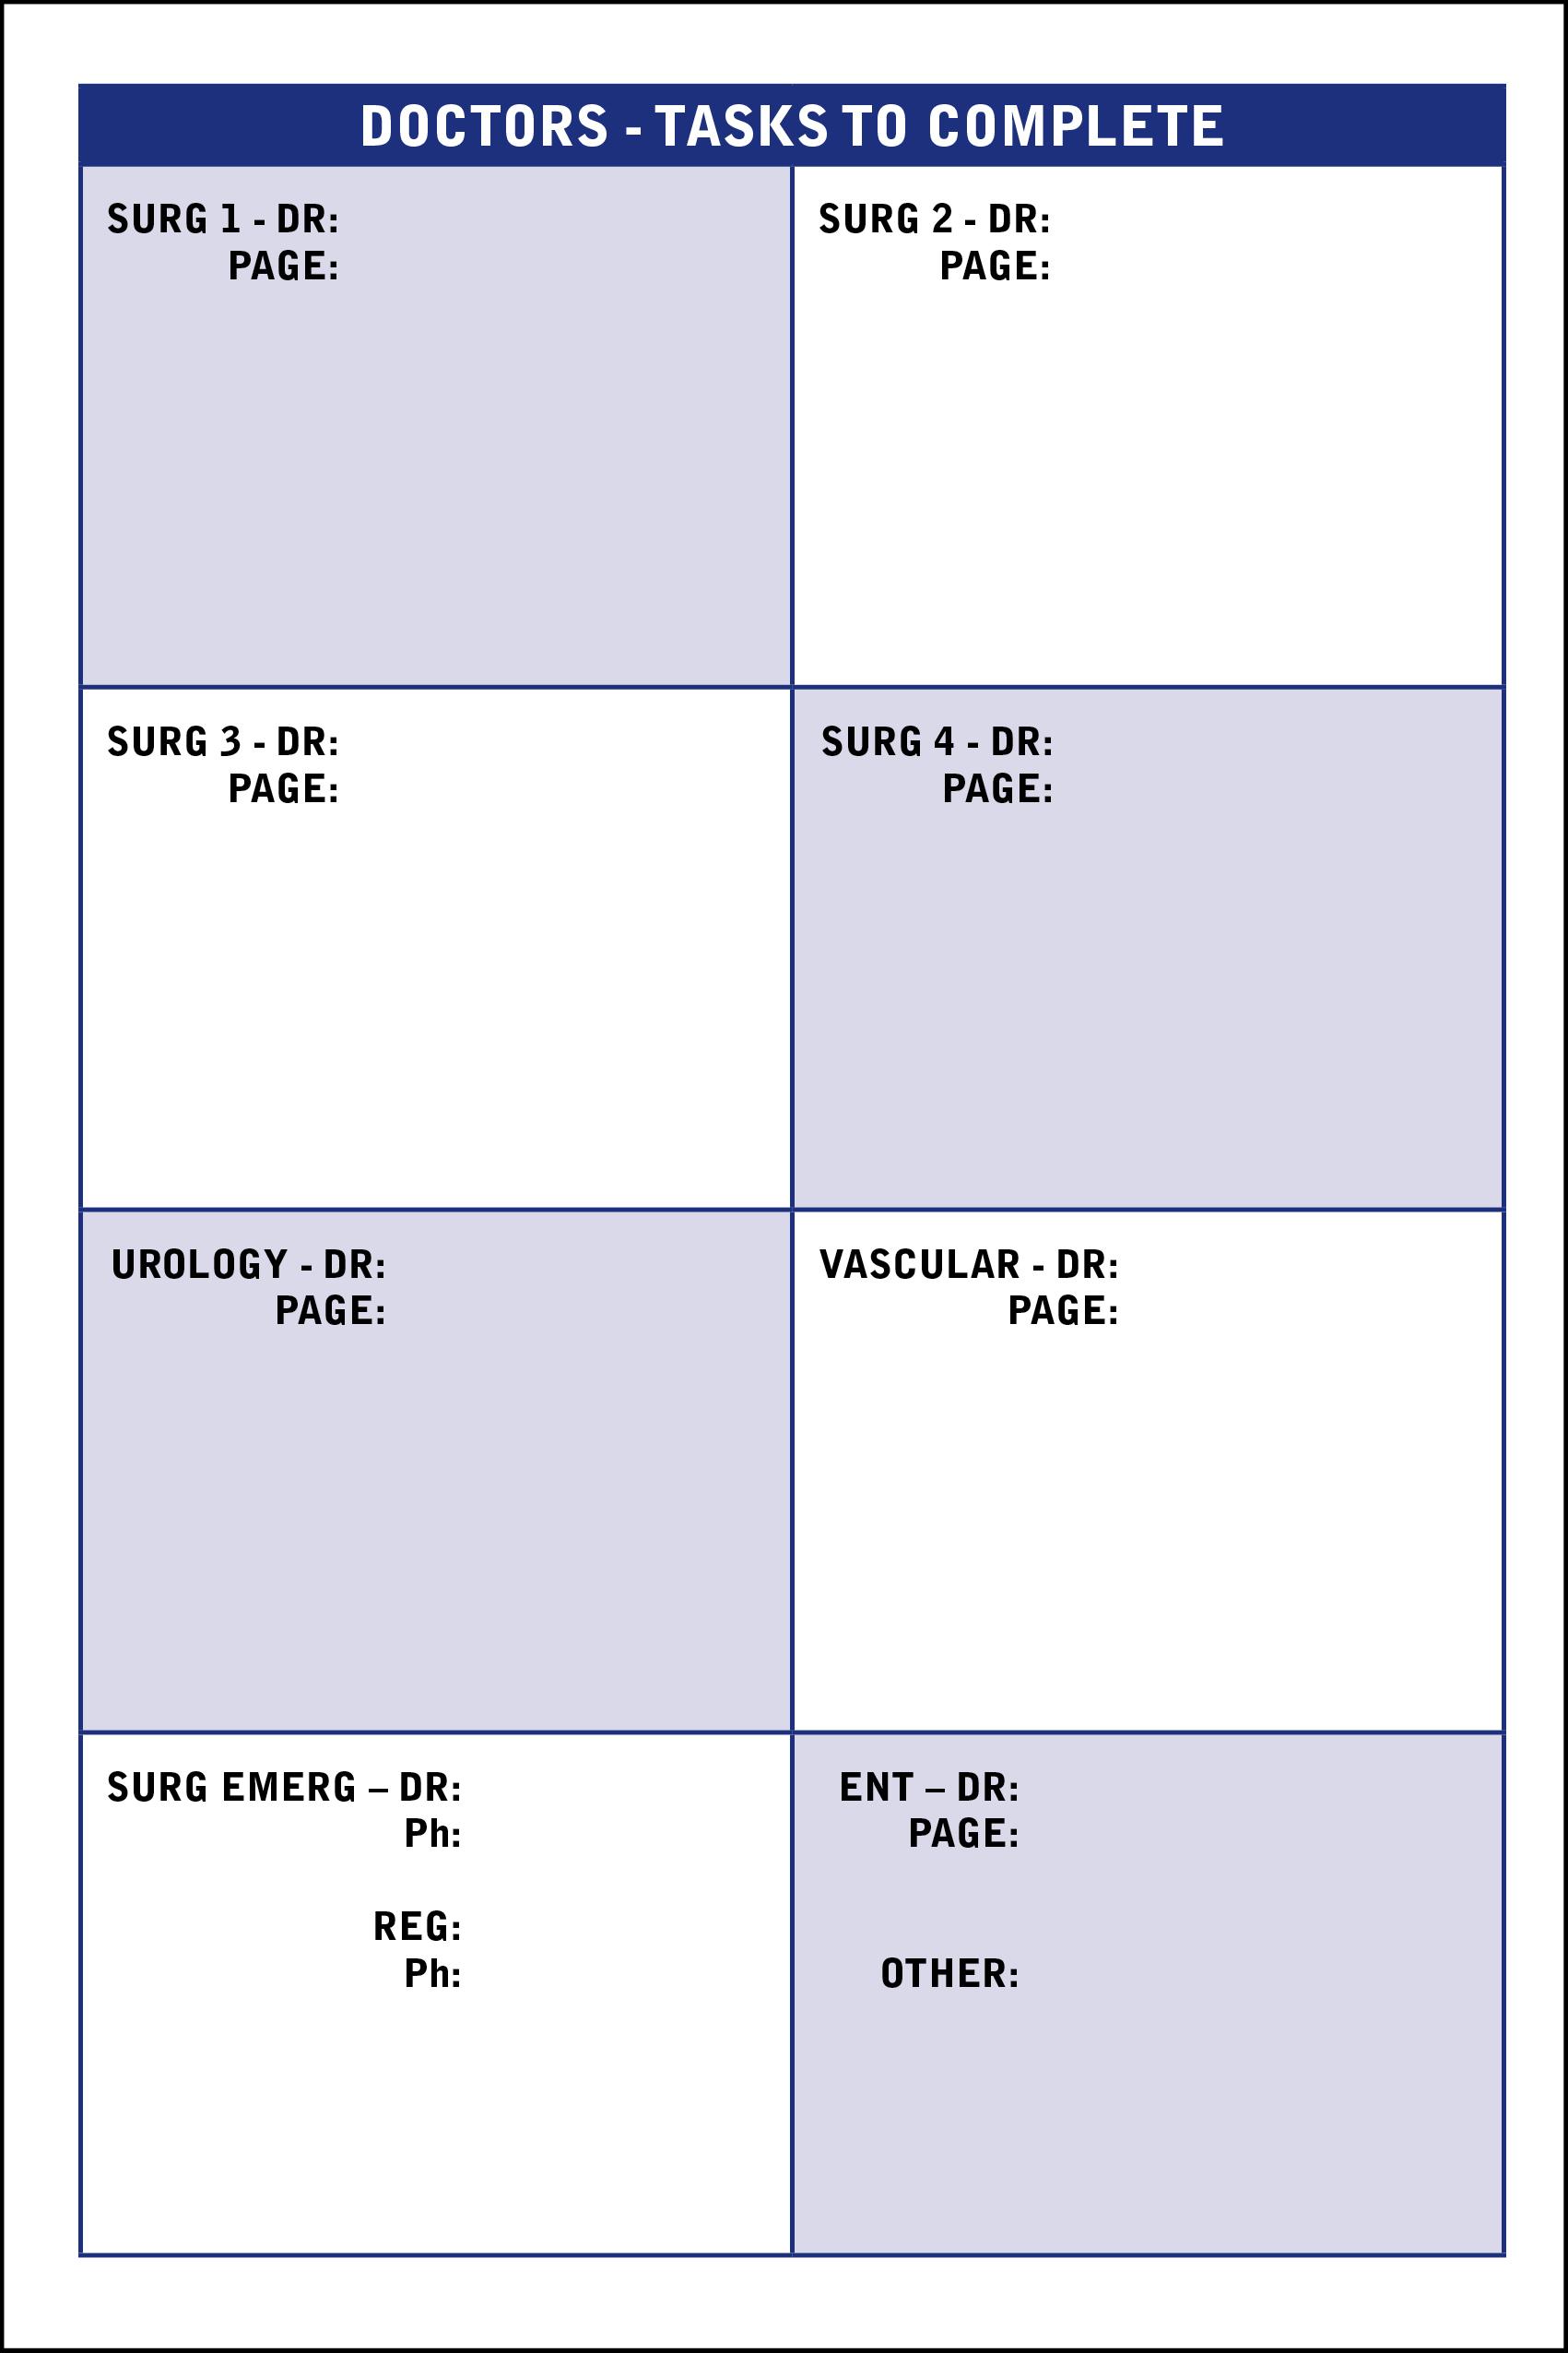 DR Task Board_600x900.jpg